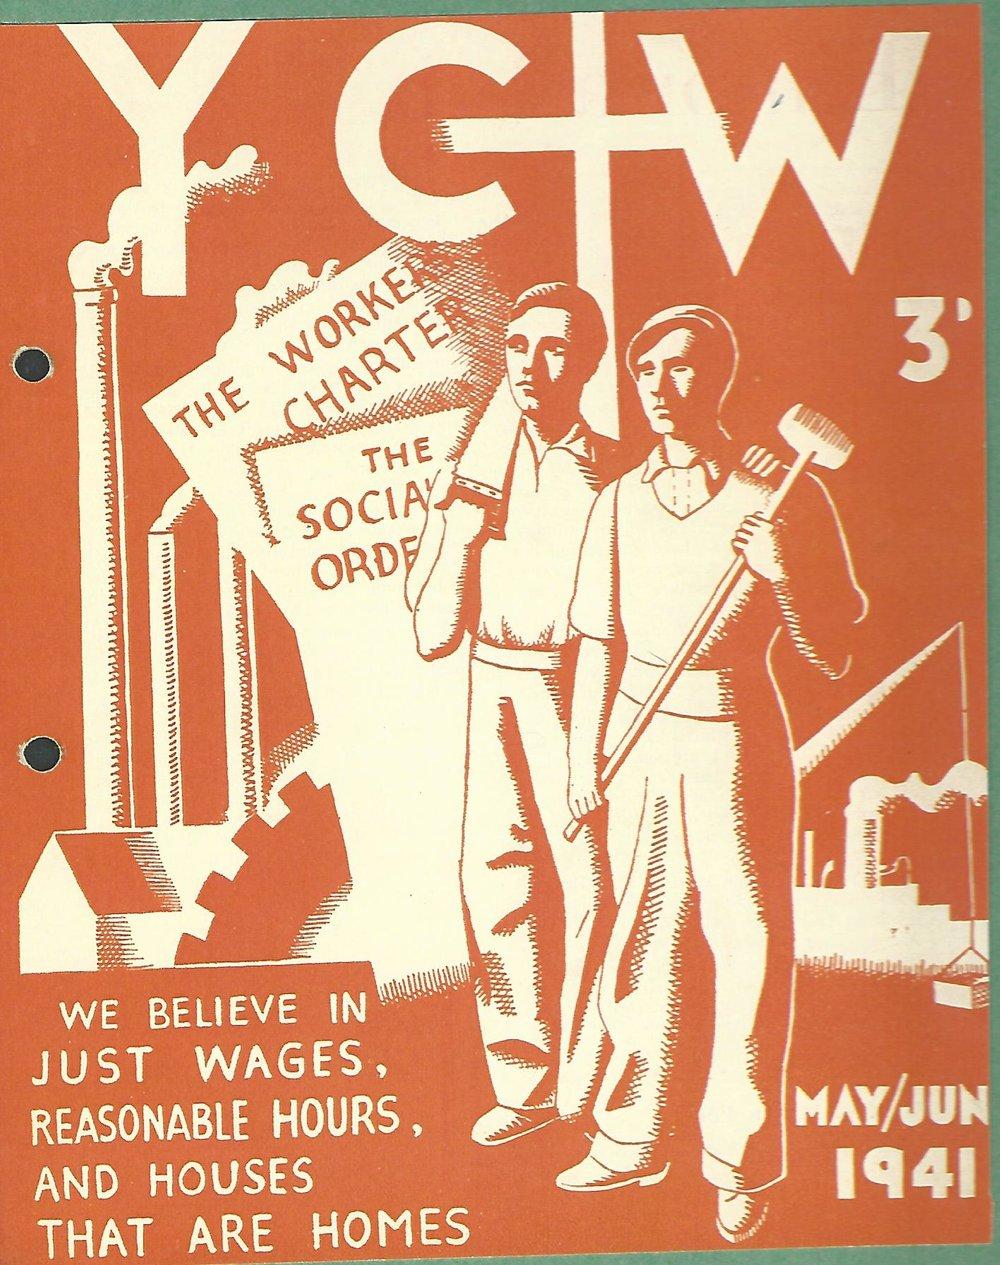 YCW Poster 1941.jpg